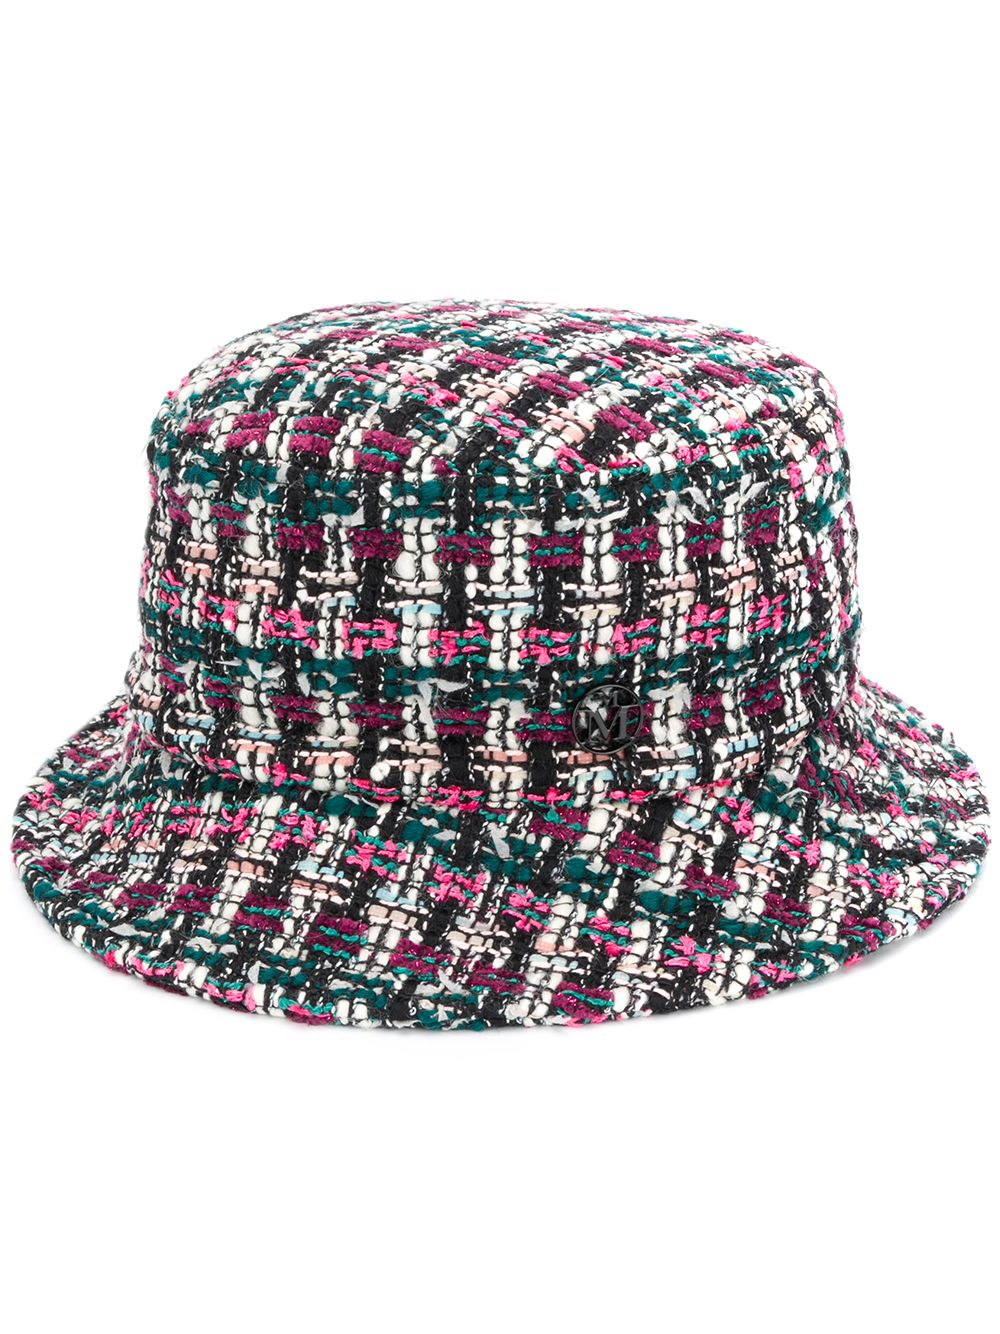 Jason Hat